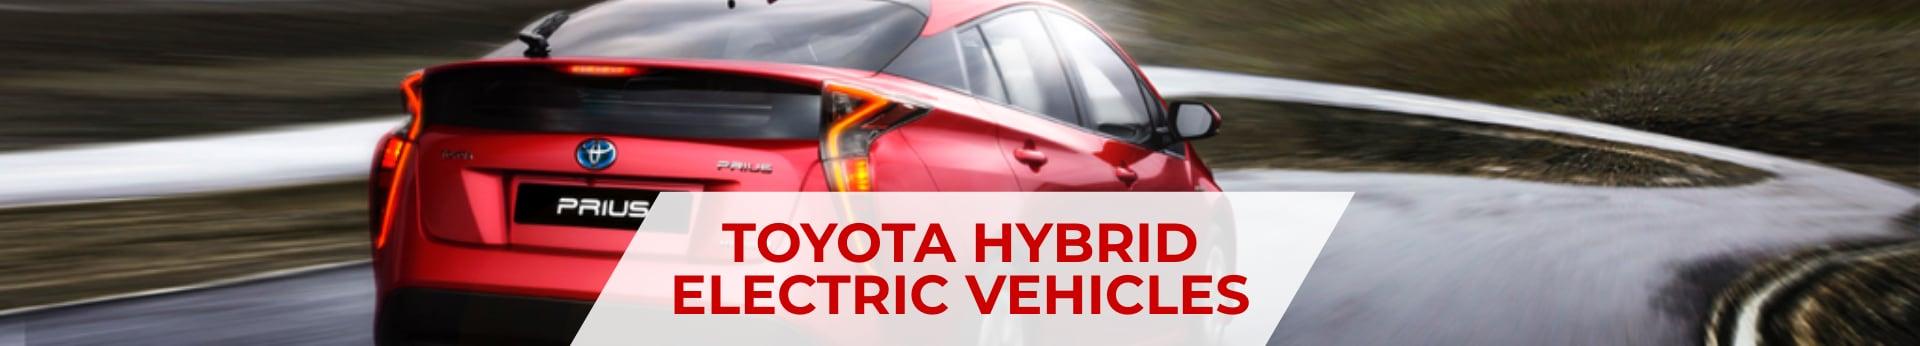 Toyota Hybrid Electric Vehicles